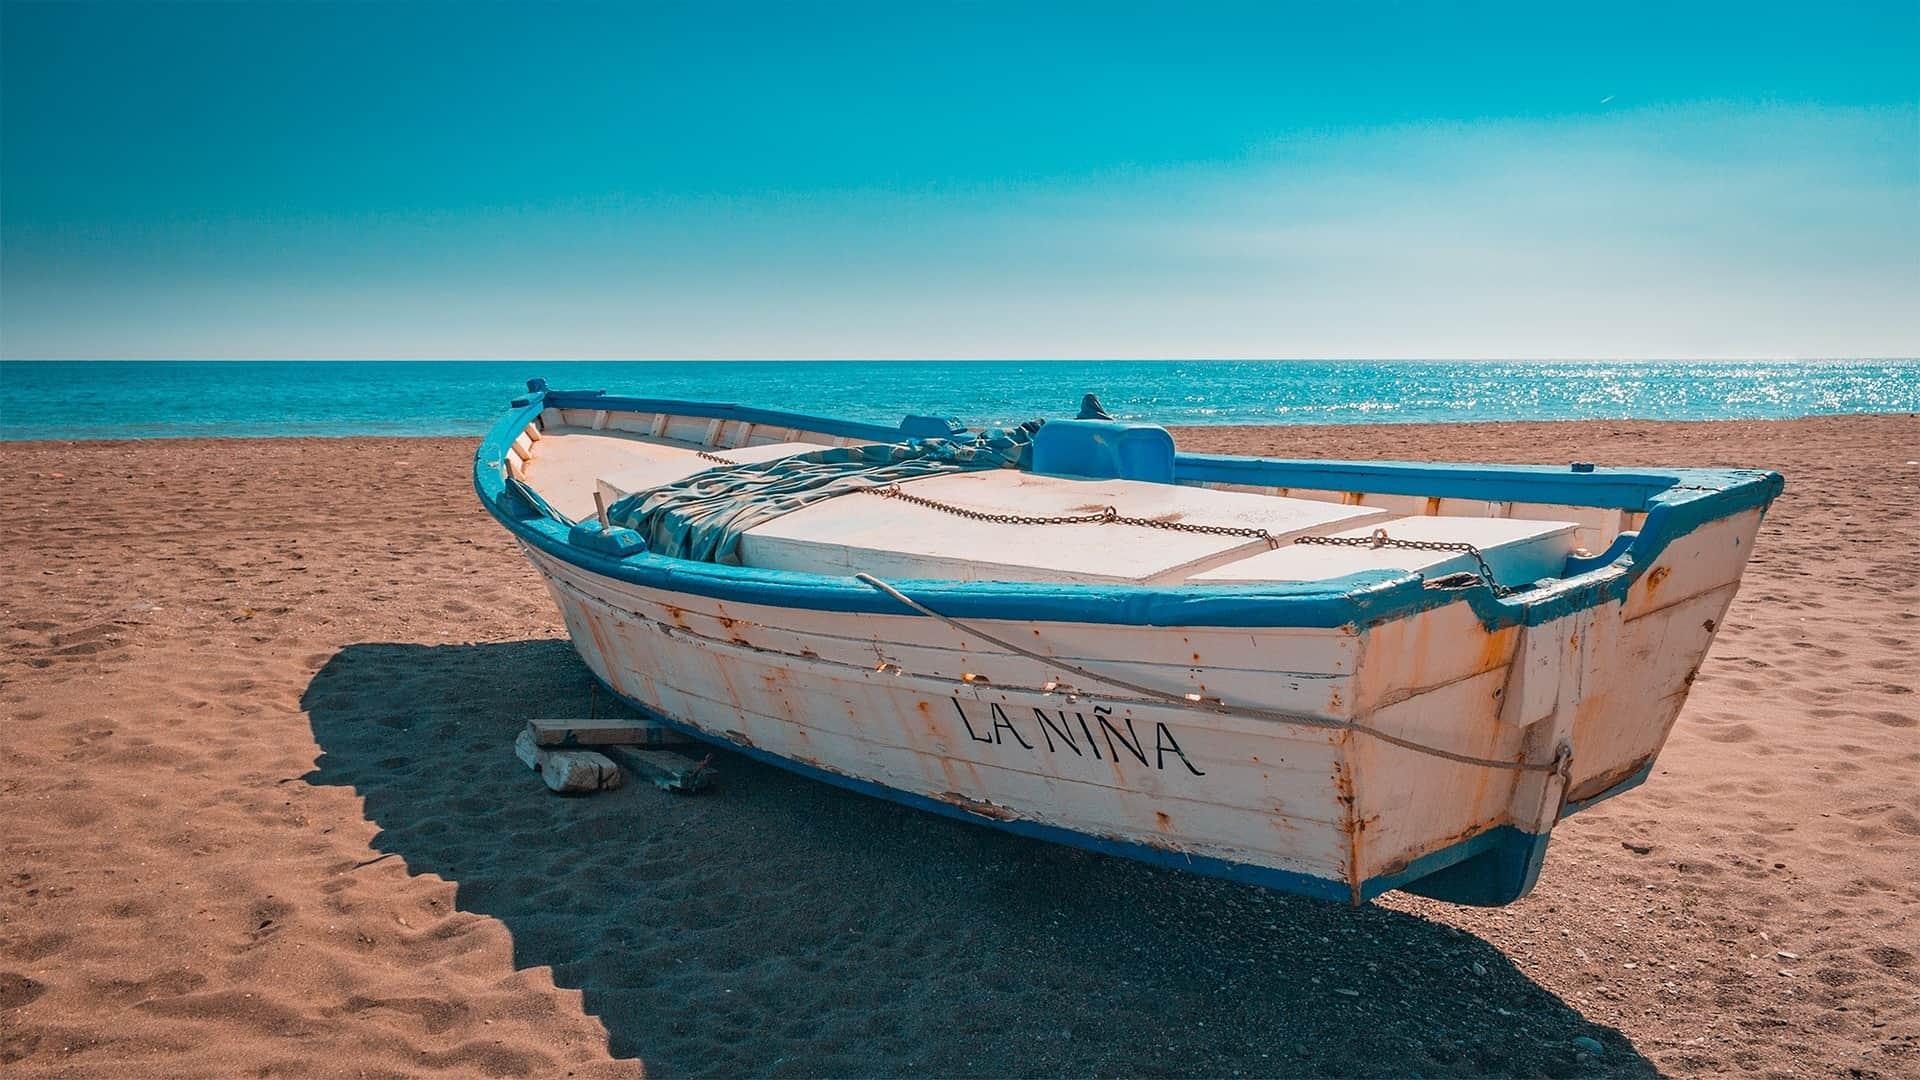 Urlaub Conil De La Fronetra All Inclusive - nur 155,00€ 4 Pauschalreise